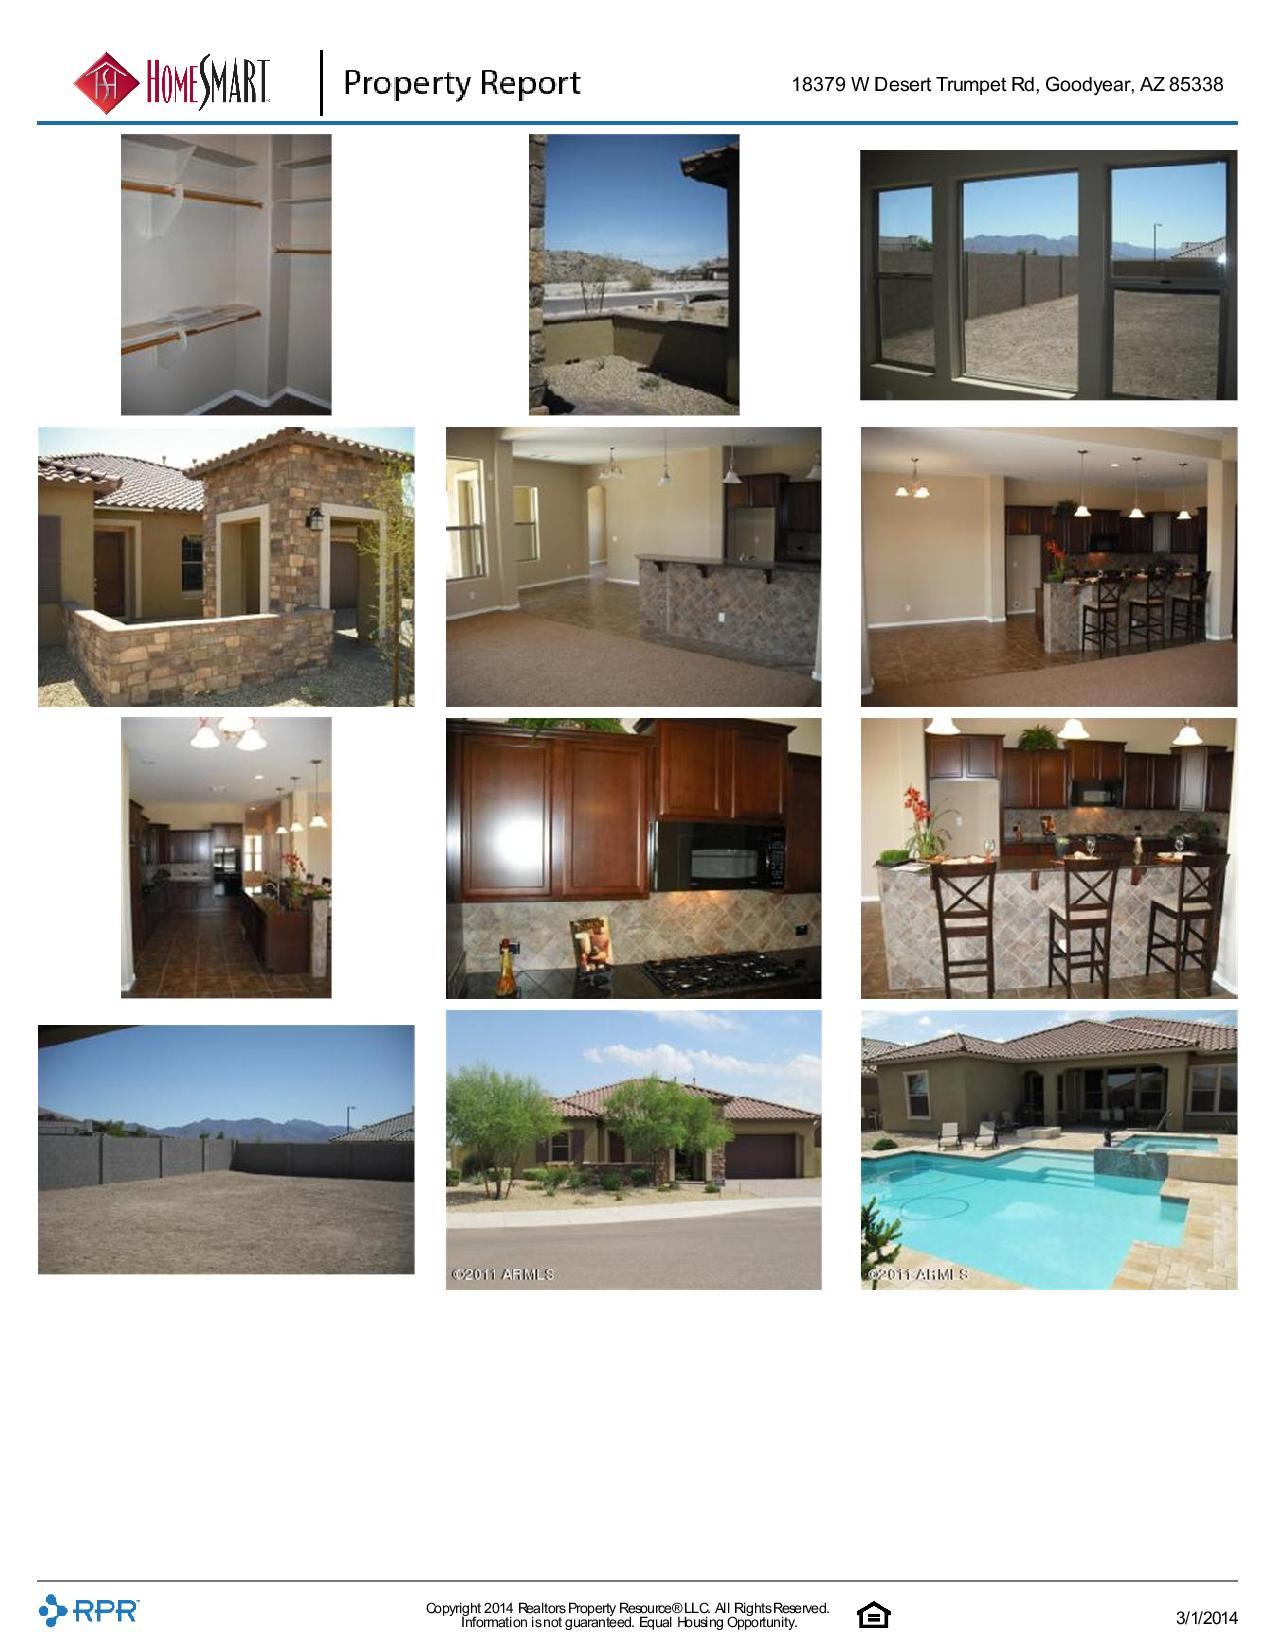 18379-W-Desert-Trumpet-Rd-Goodyear-AZ-85338-page-008